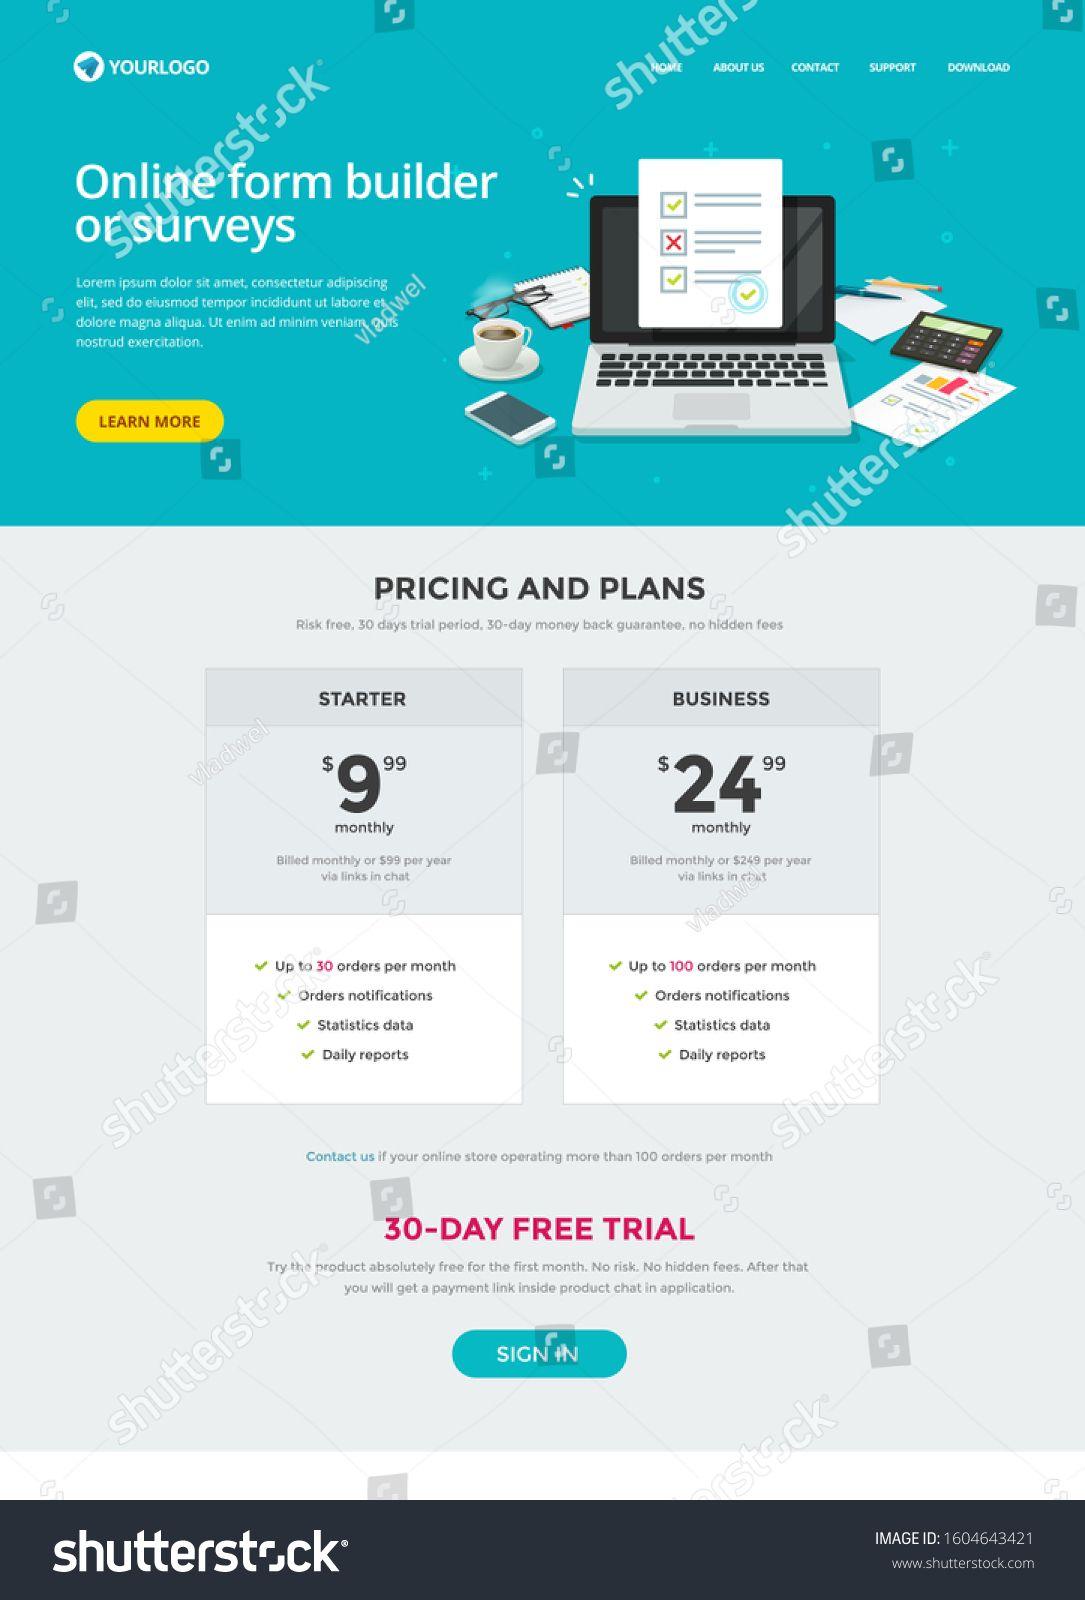 Survey form builder web site template design or